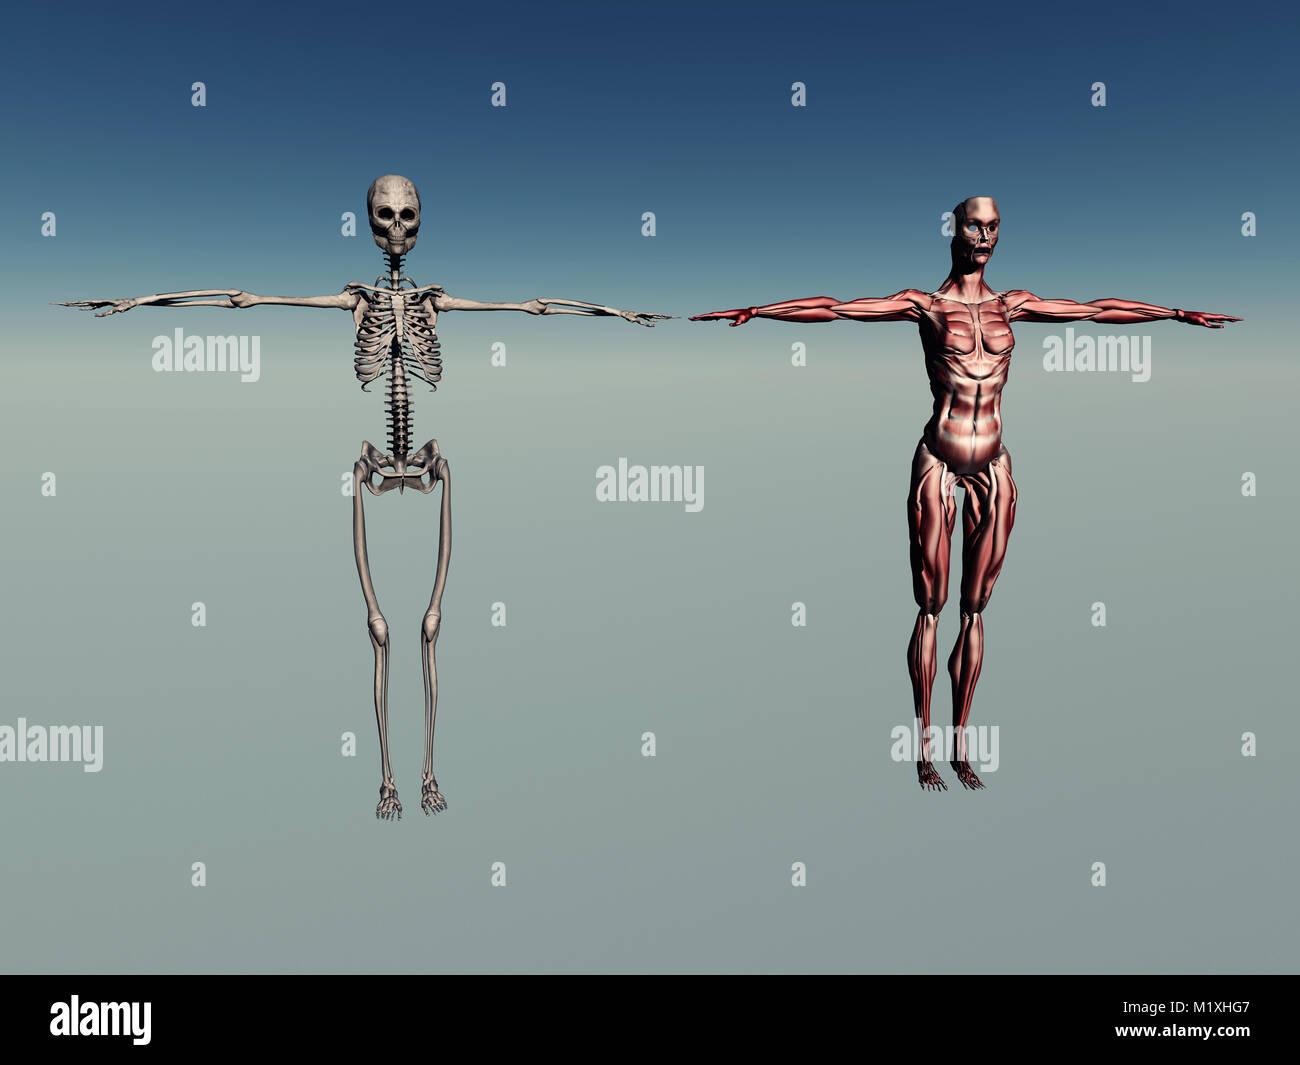 Human Joints Imágenes De Stock & Human Joints Fotos De Stock - Alamy